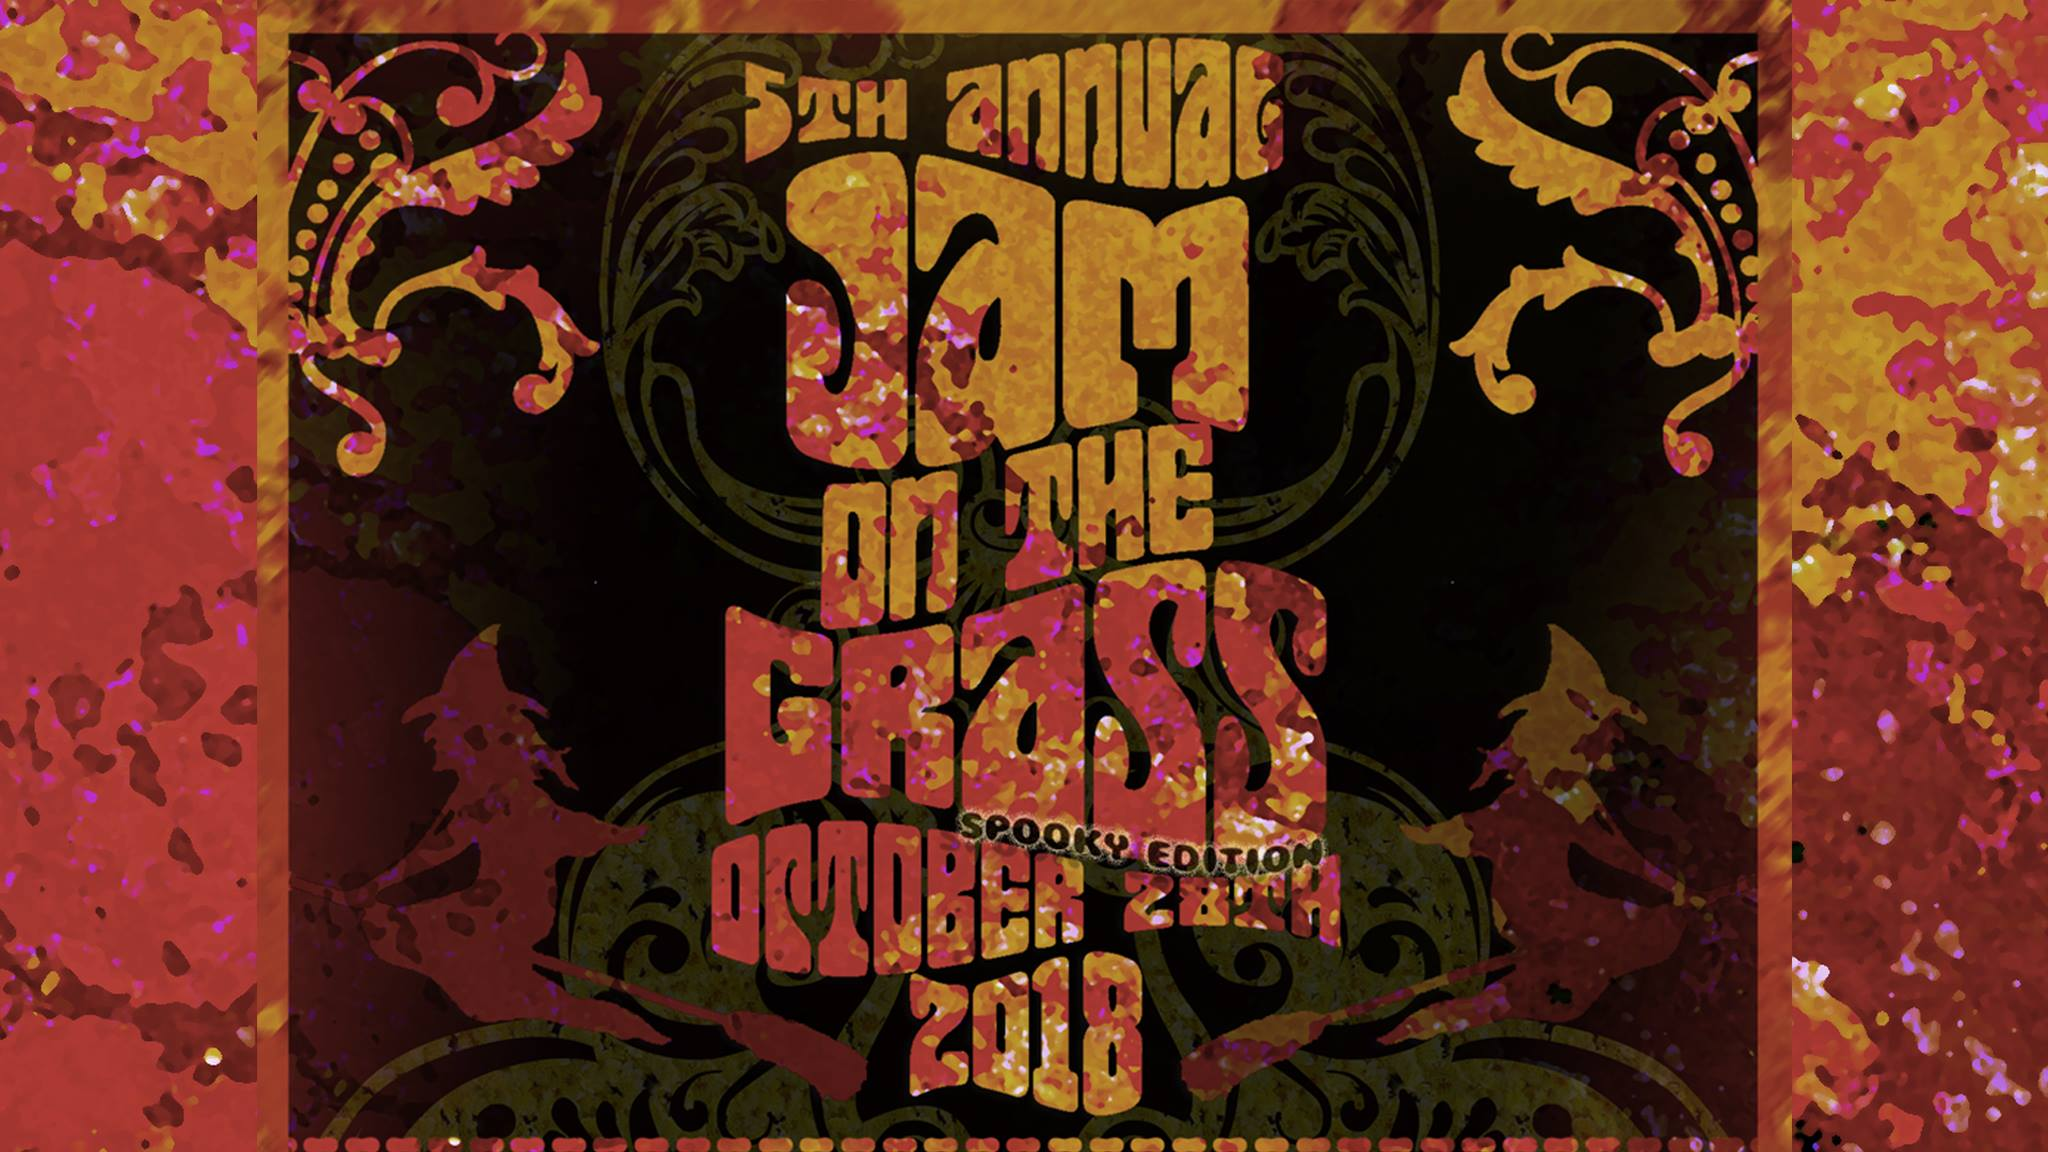 5th Annual Jam On The Grass Festival: Spooky Edition